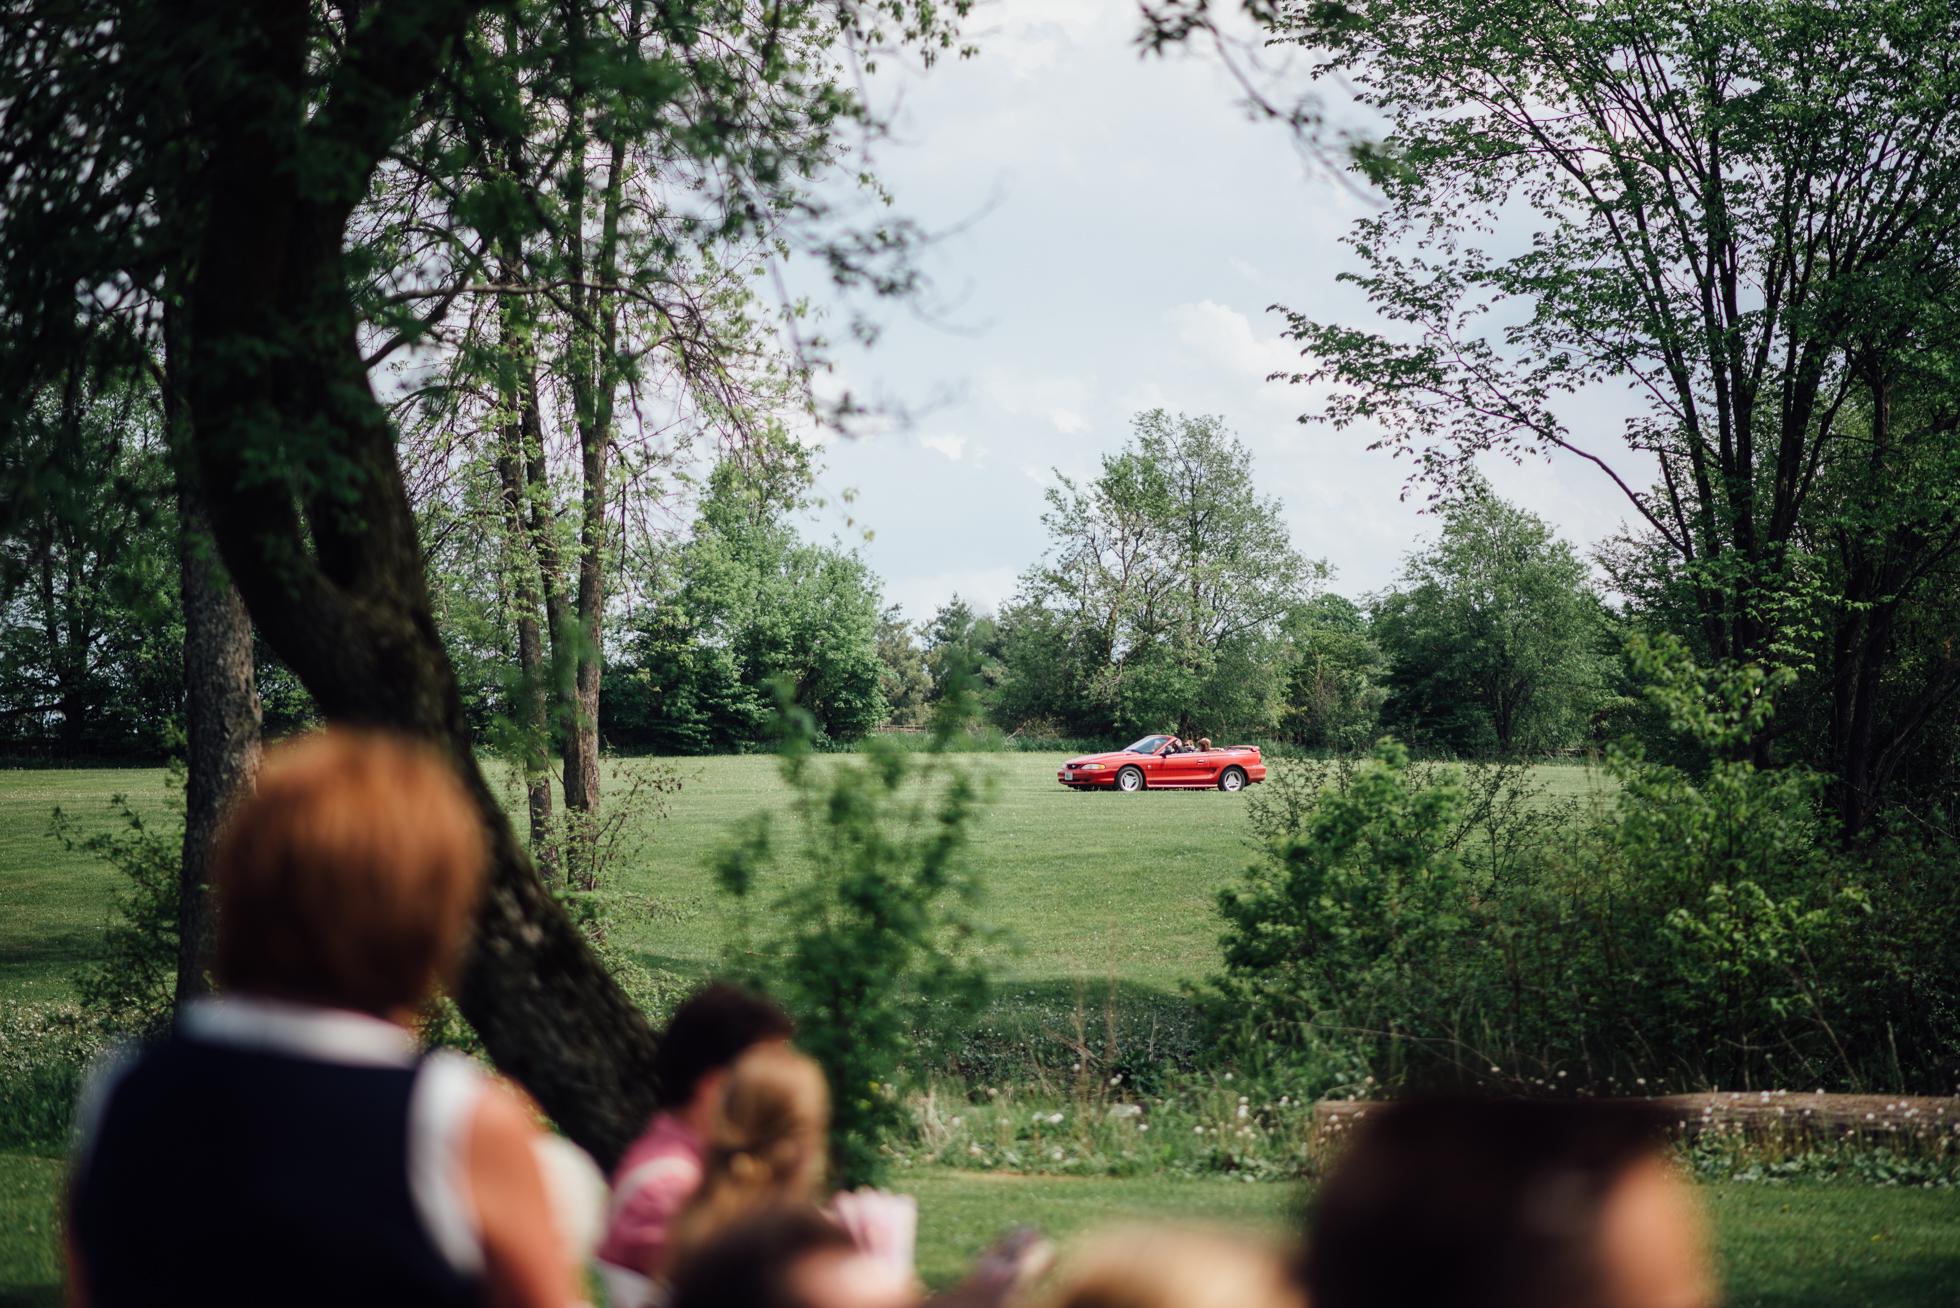 Outdoor-Caledon-Tralee-Wedding-Photography-47